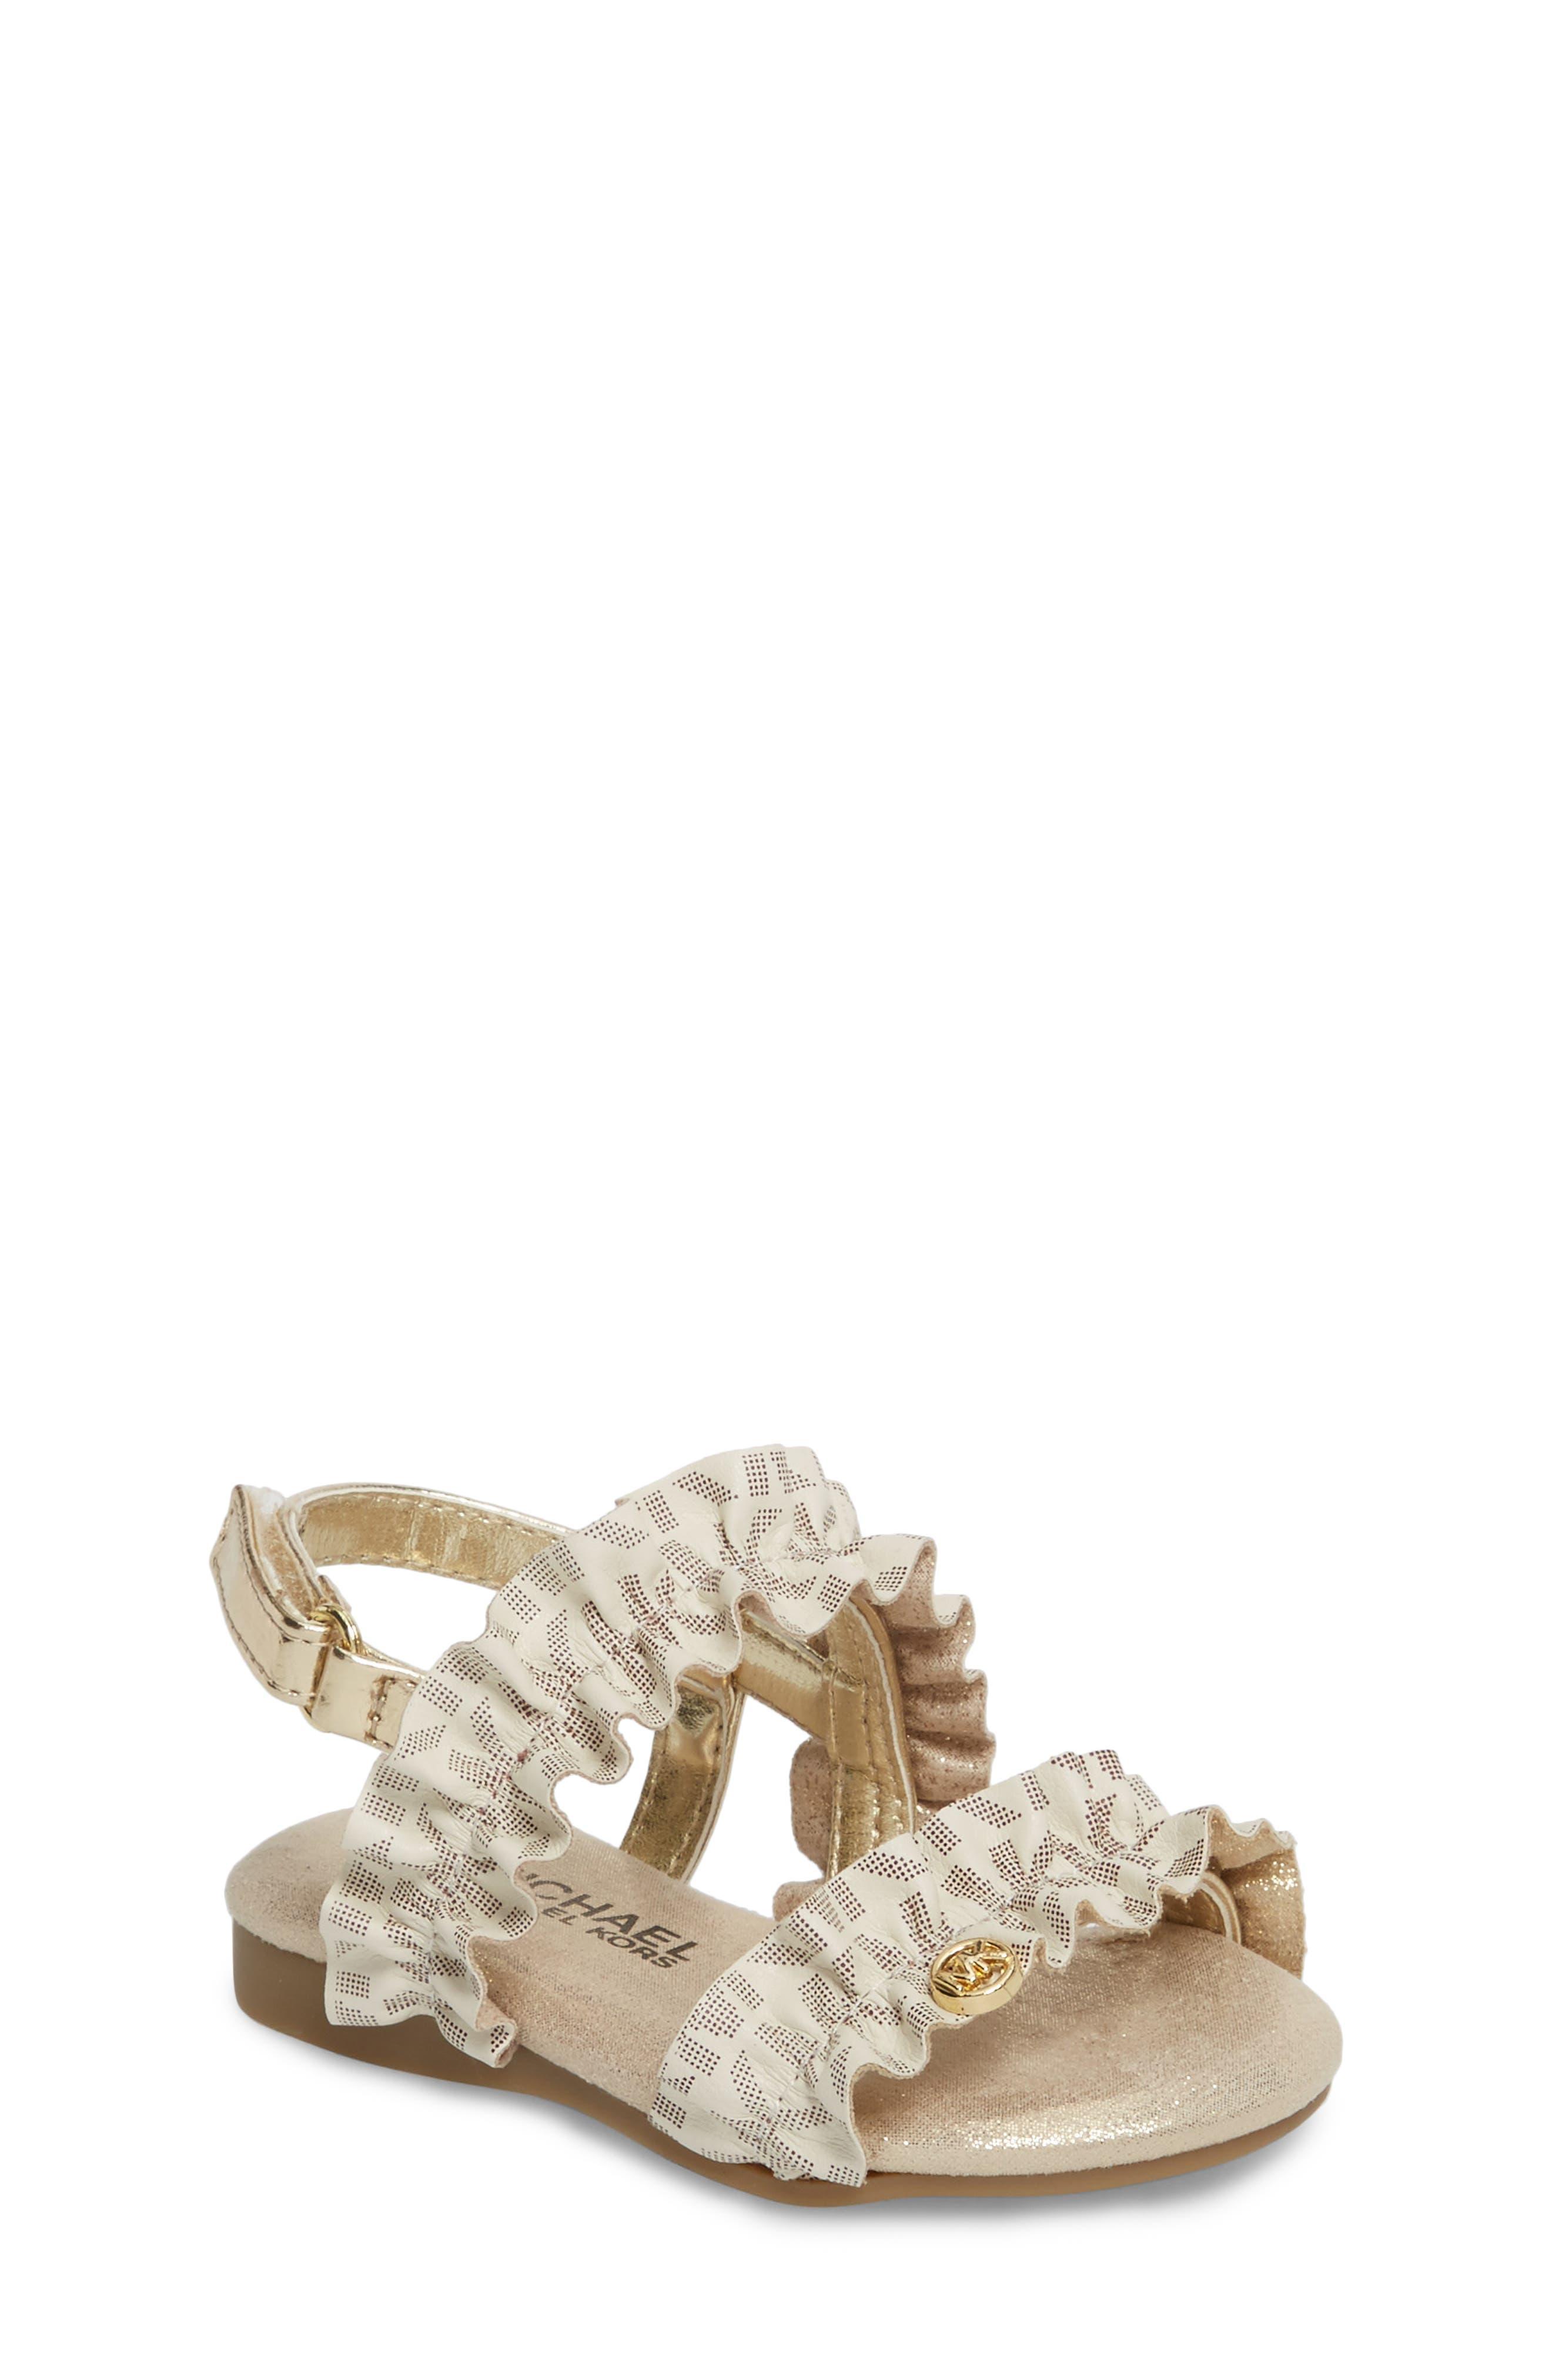 Demi Frillz Sandal,                         Main,                         color, Vanilla Gold